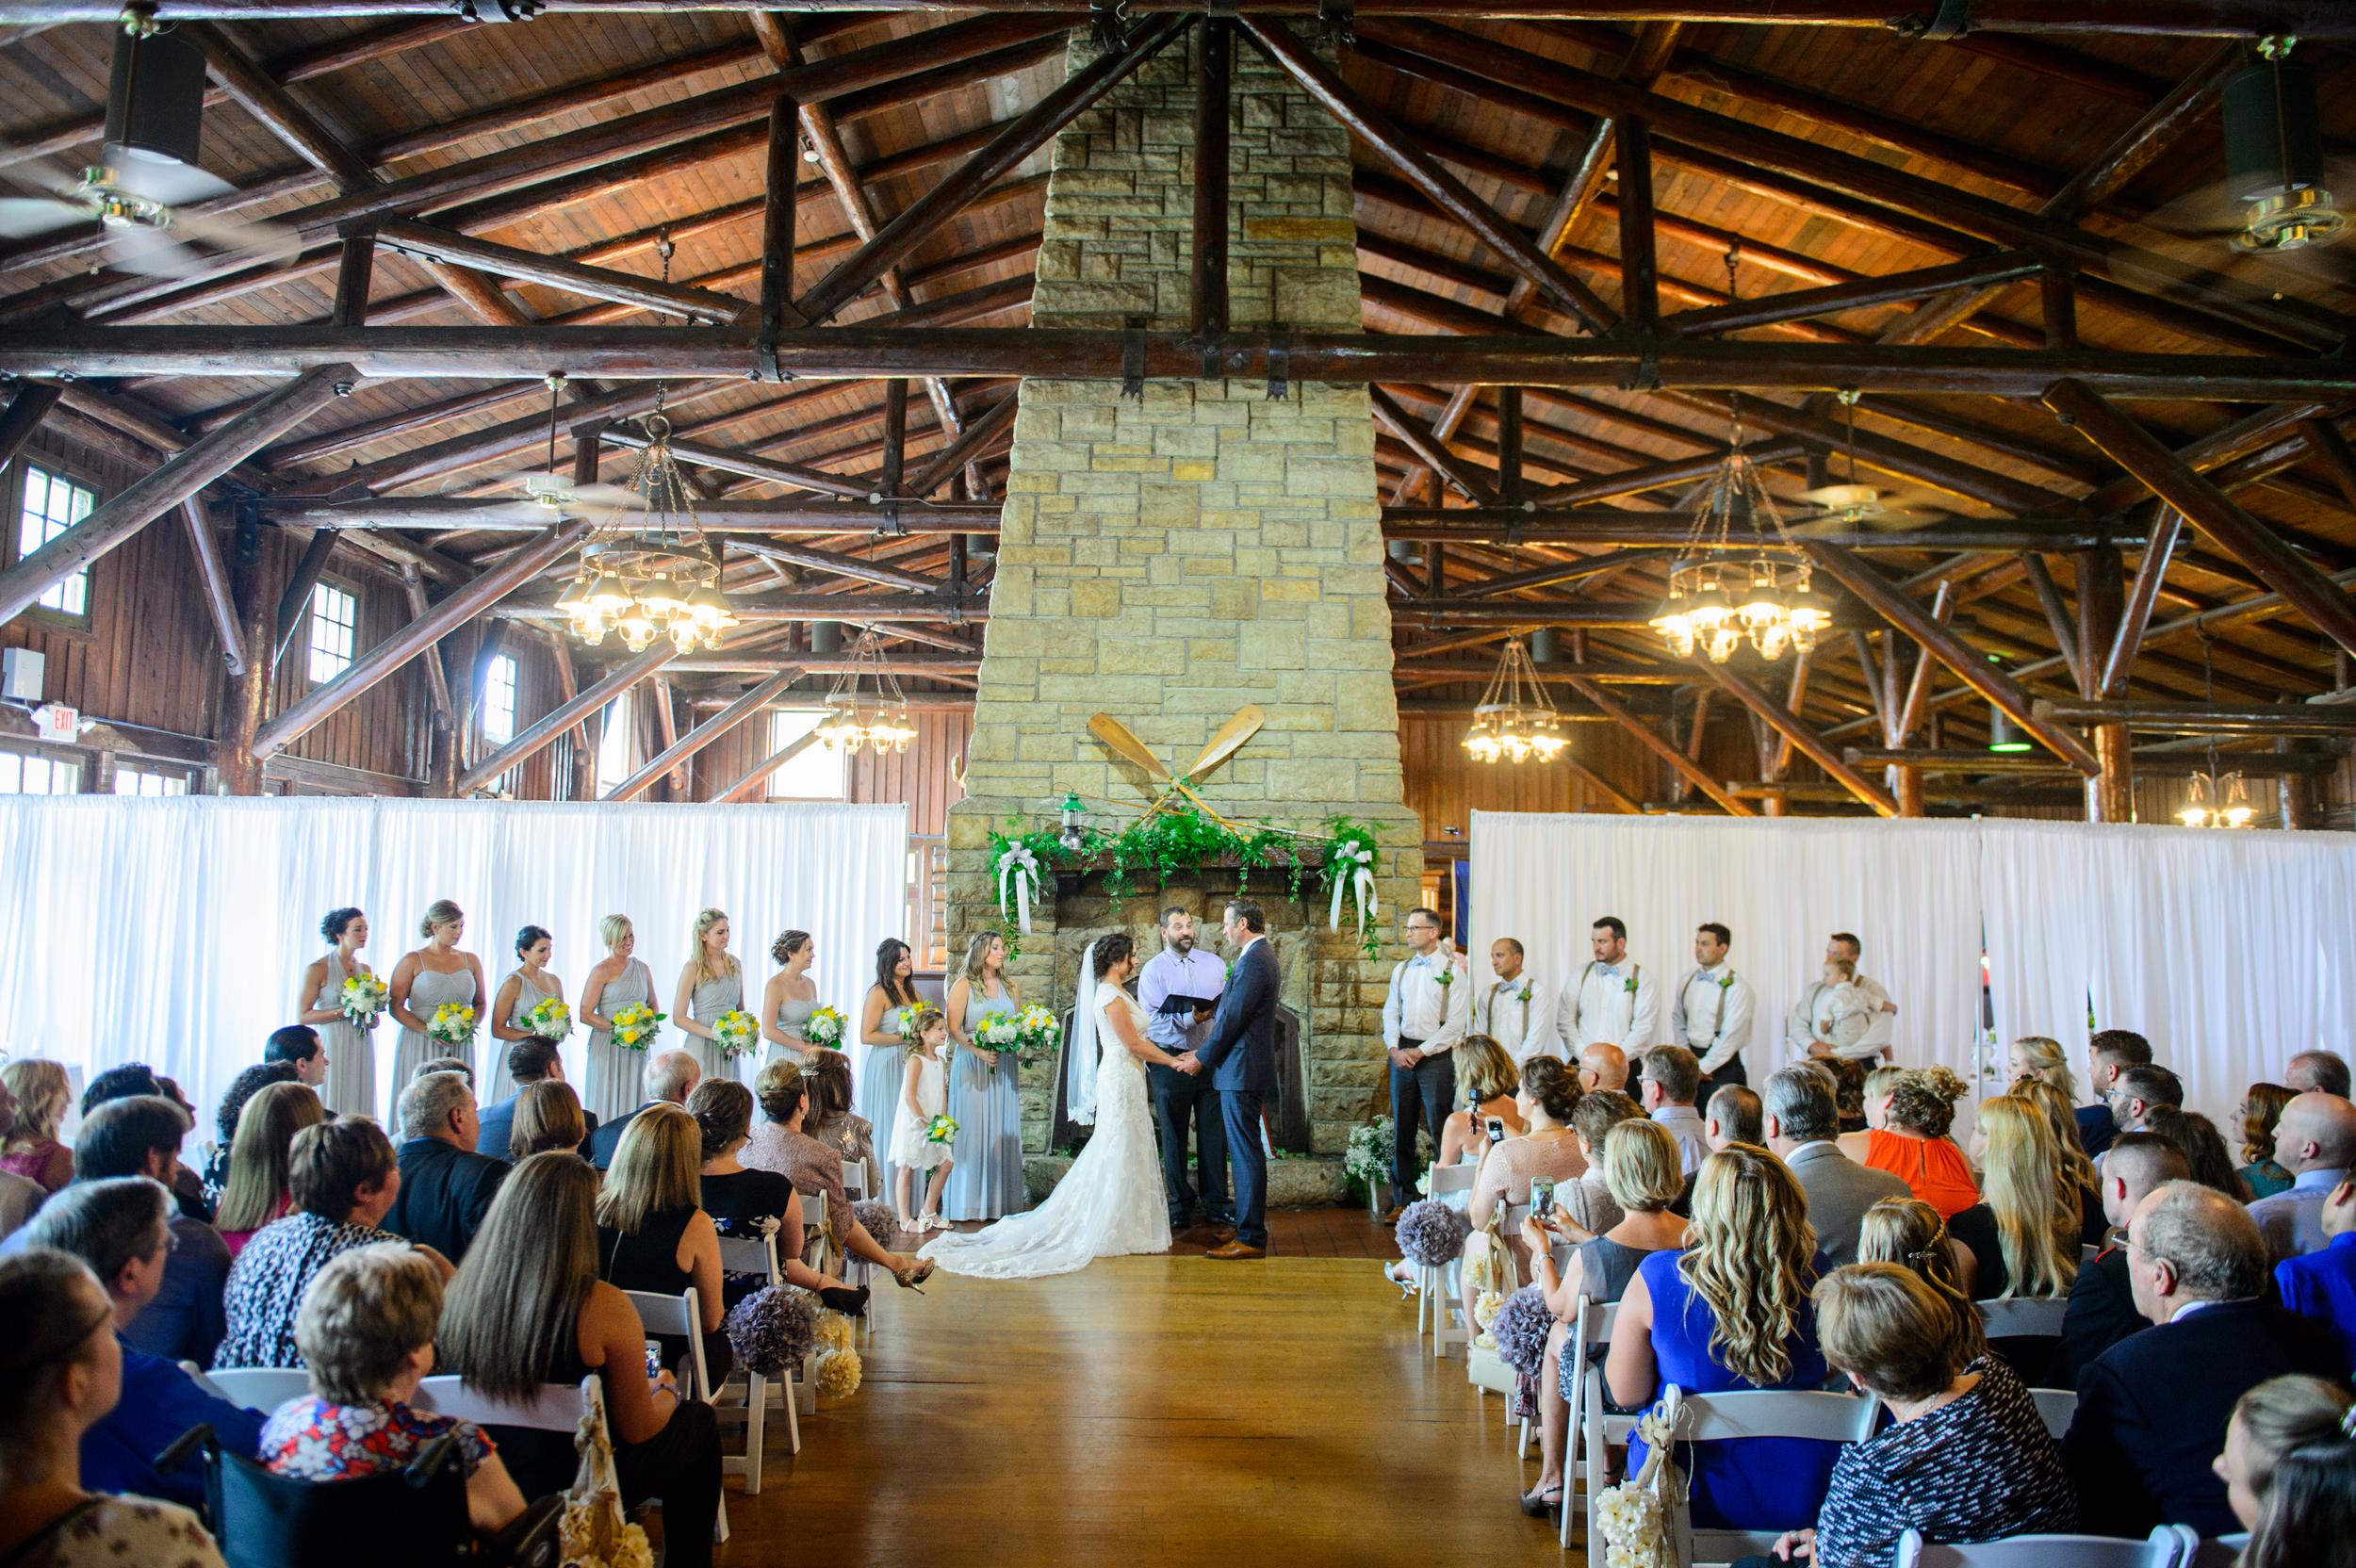 indoor-summer-wedding-starved-rock-seth-morris-photography-50.jpg